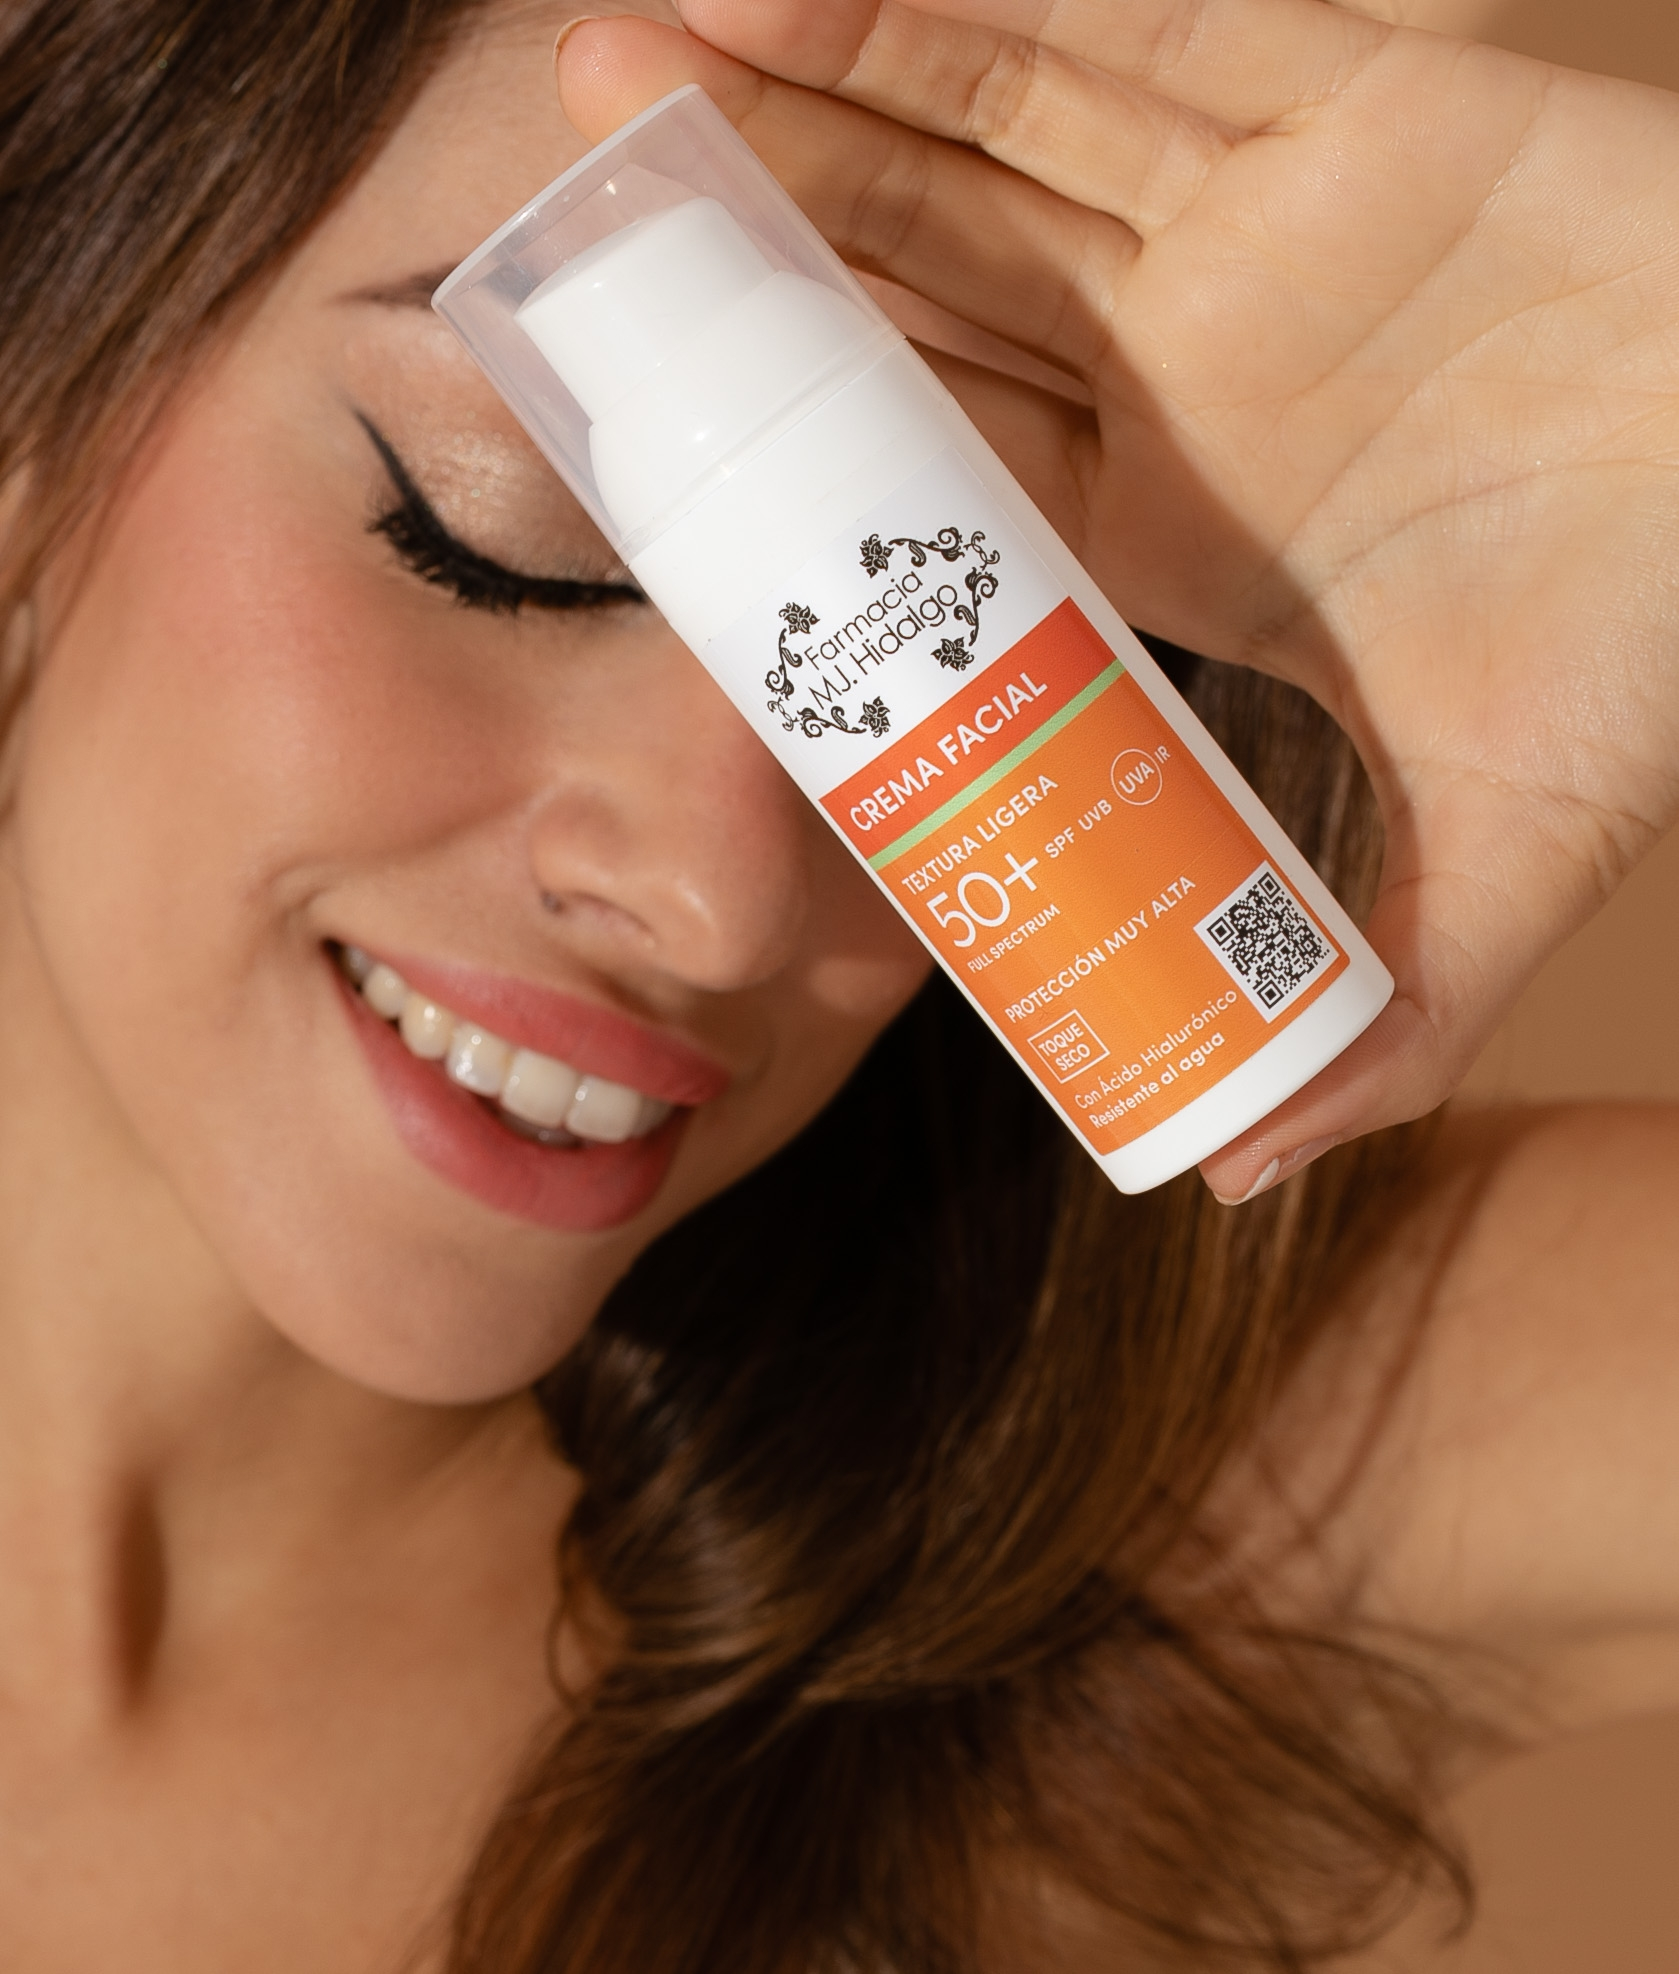 Crema Facial Spf-50 MJ Hidalgo - Textura Ligera